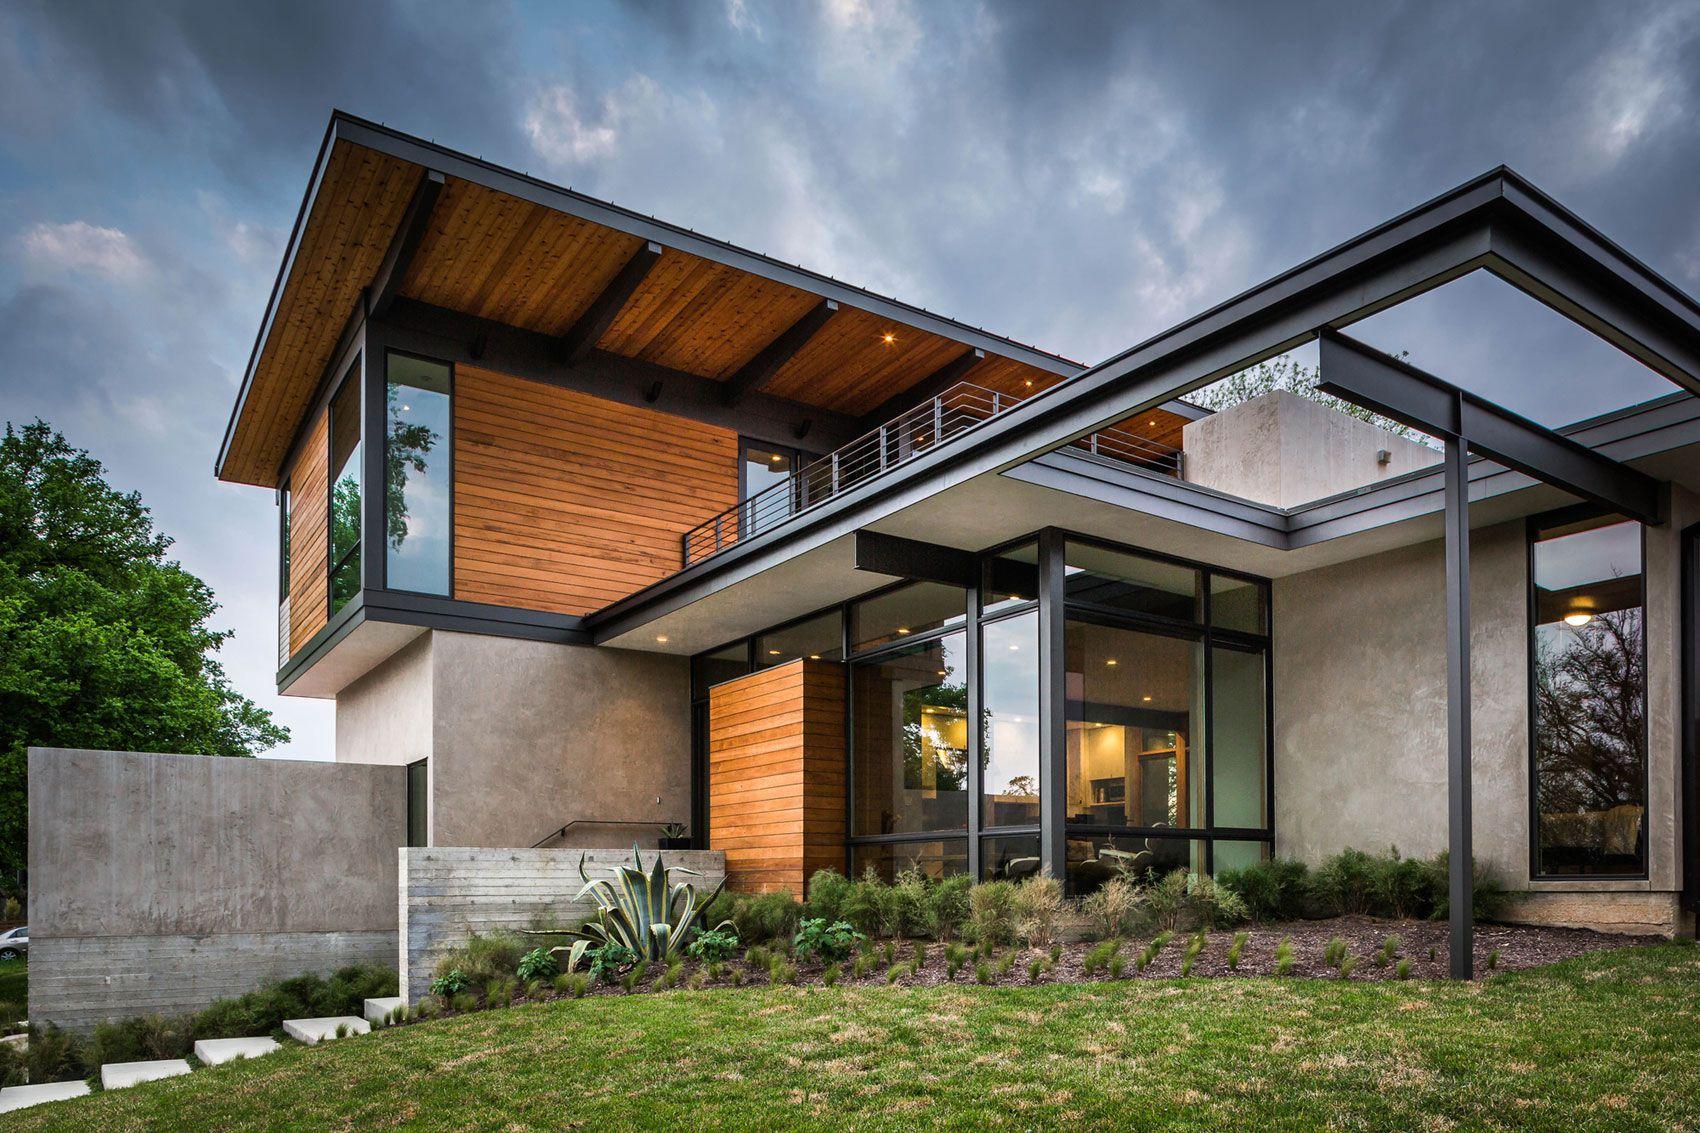 the modern Barton Hills Residence